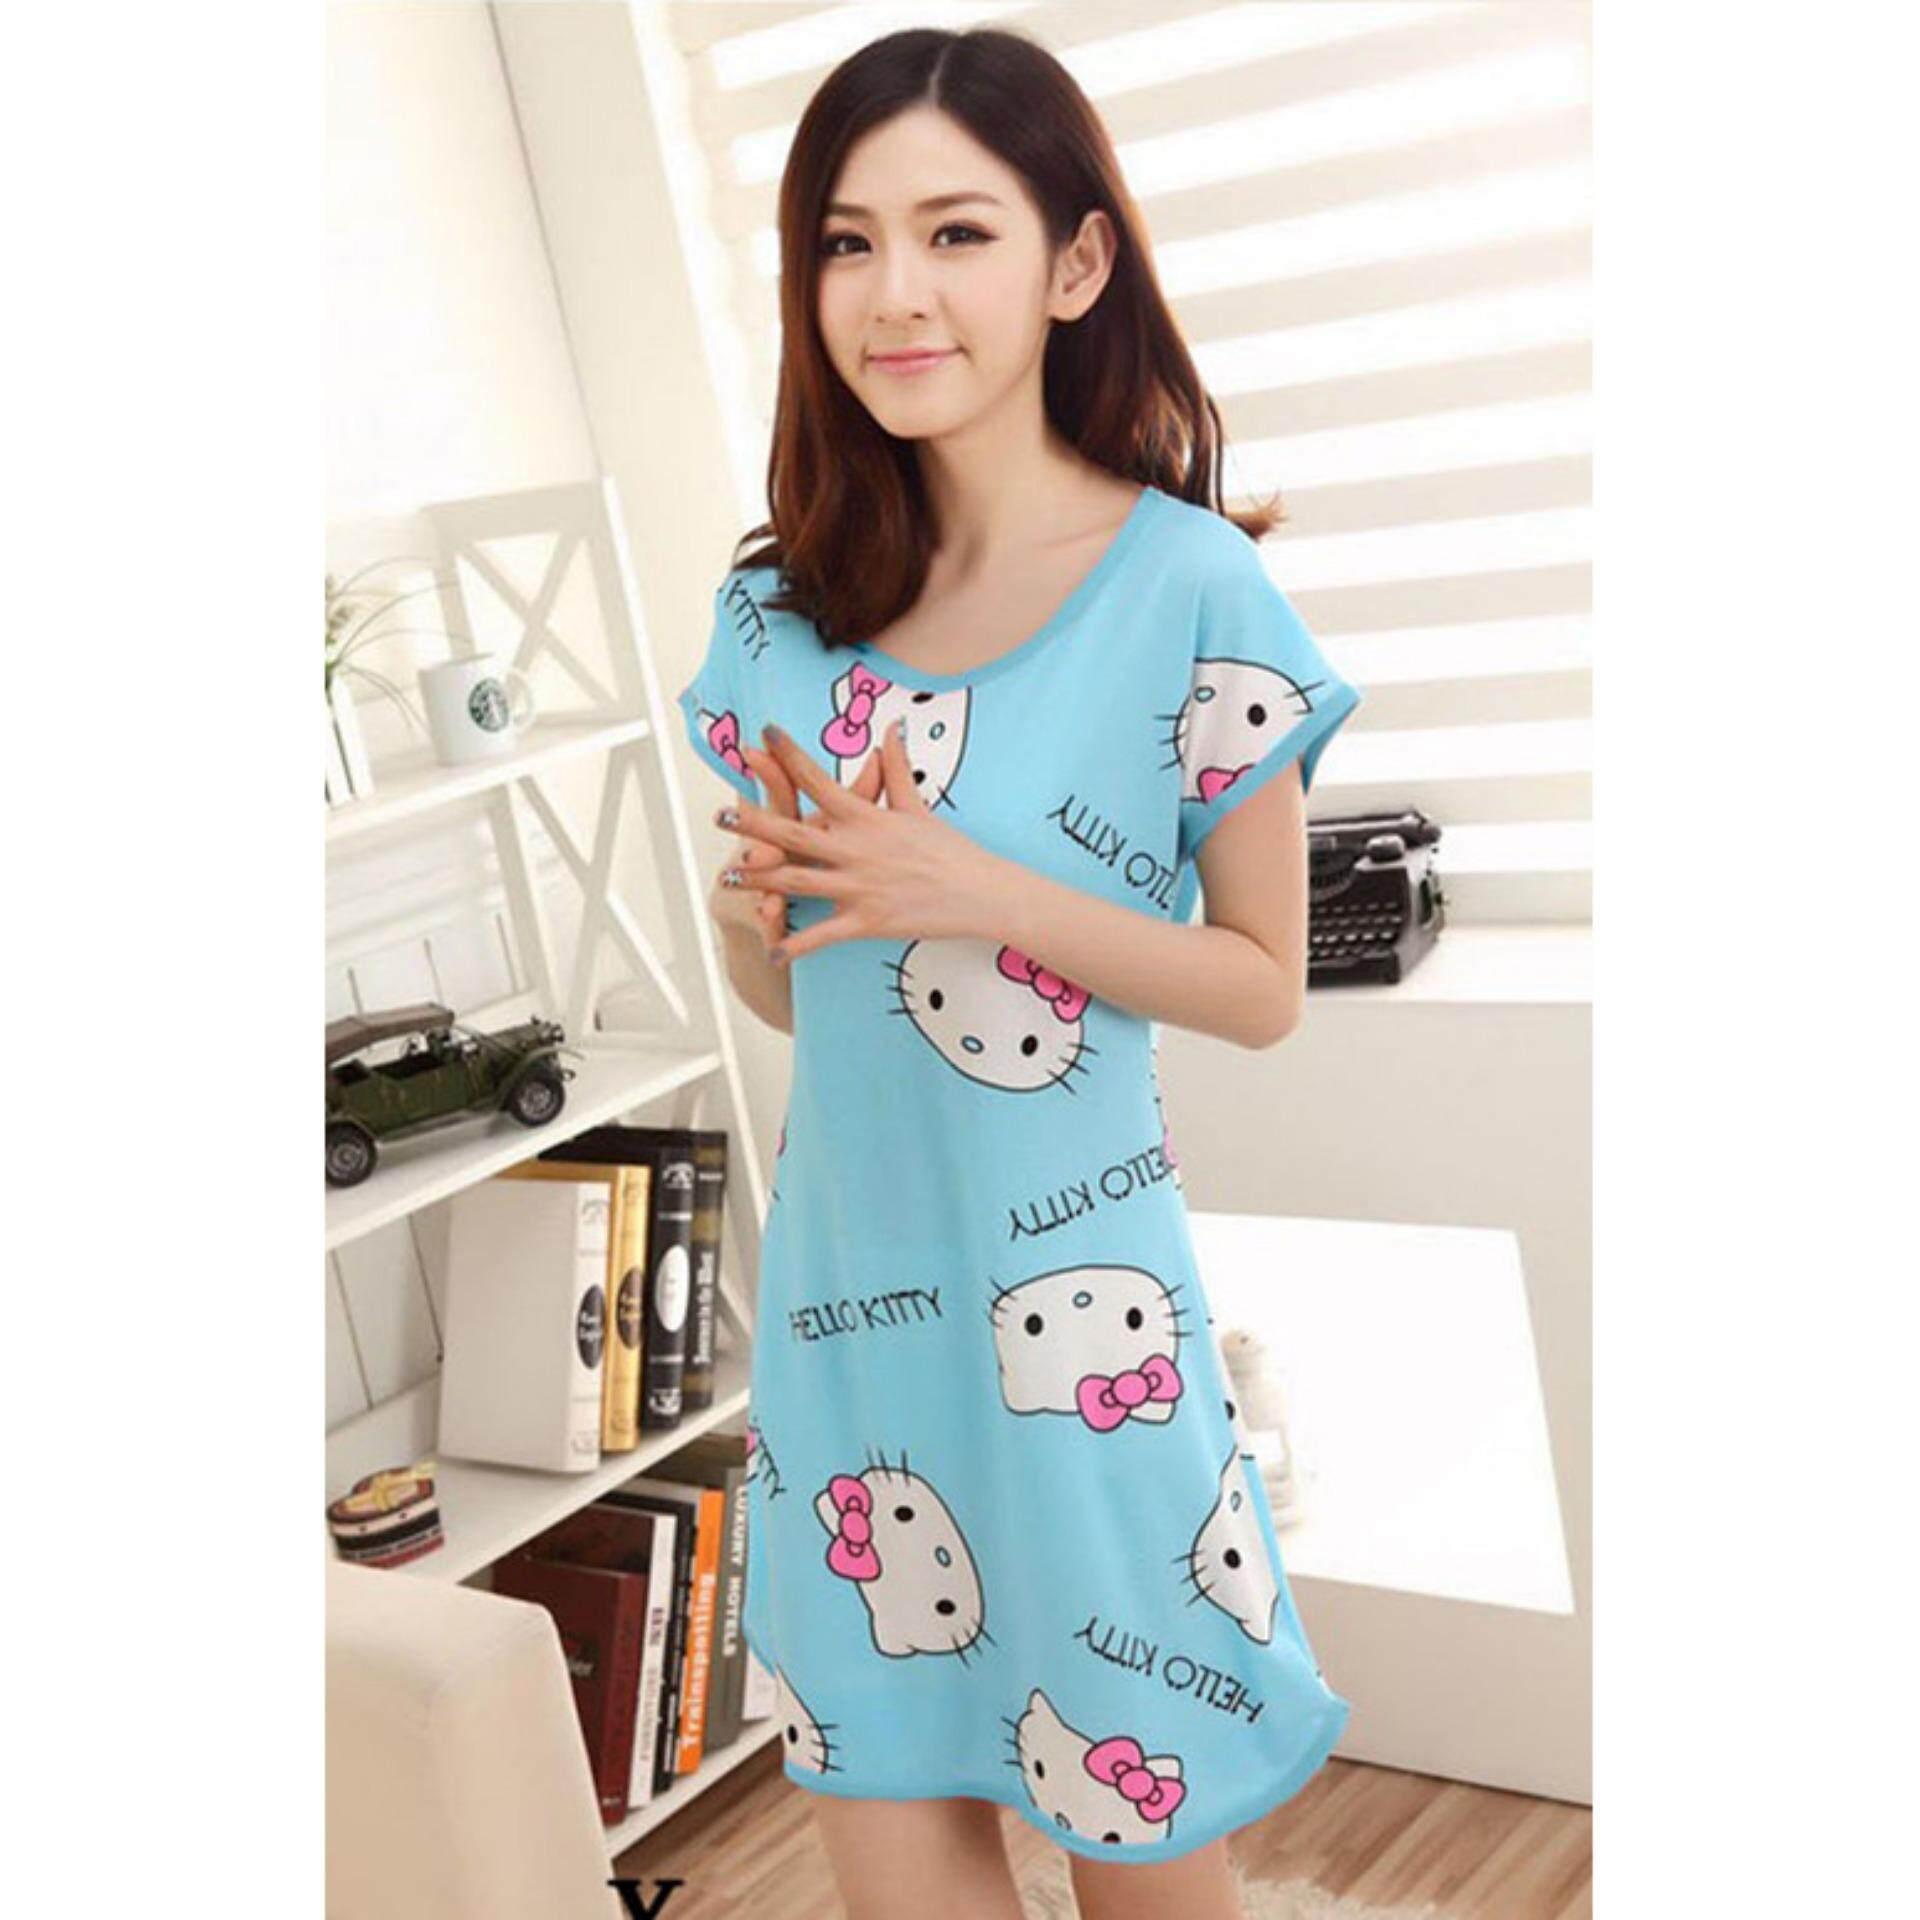 Cute & Comfy Cartoon Nightwear (Hello Kitty Blue) - 1pc